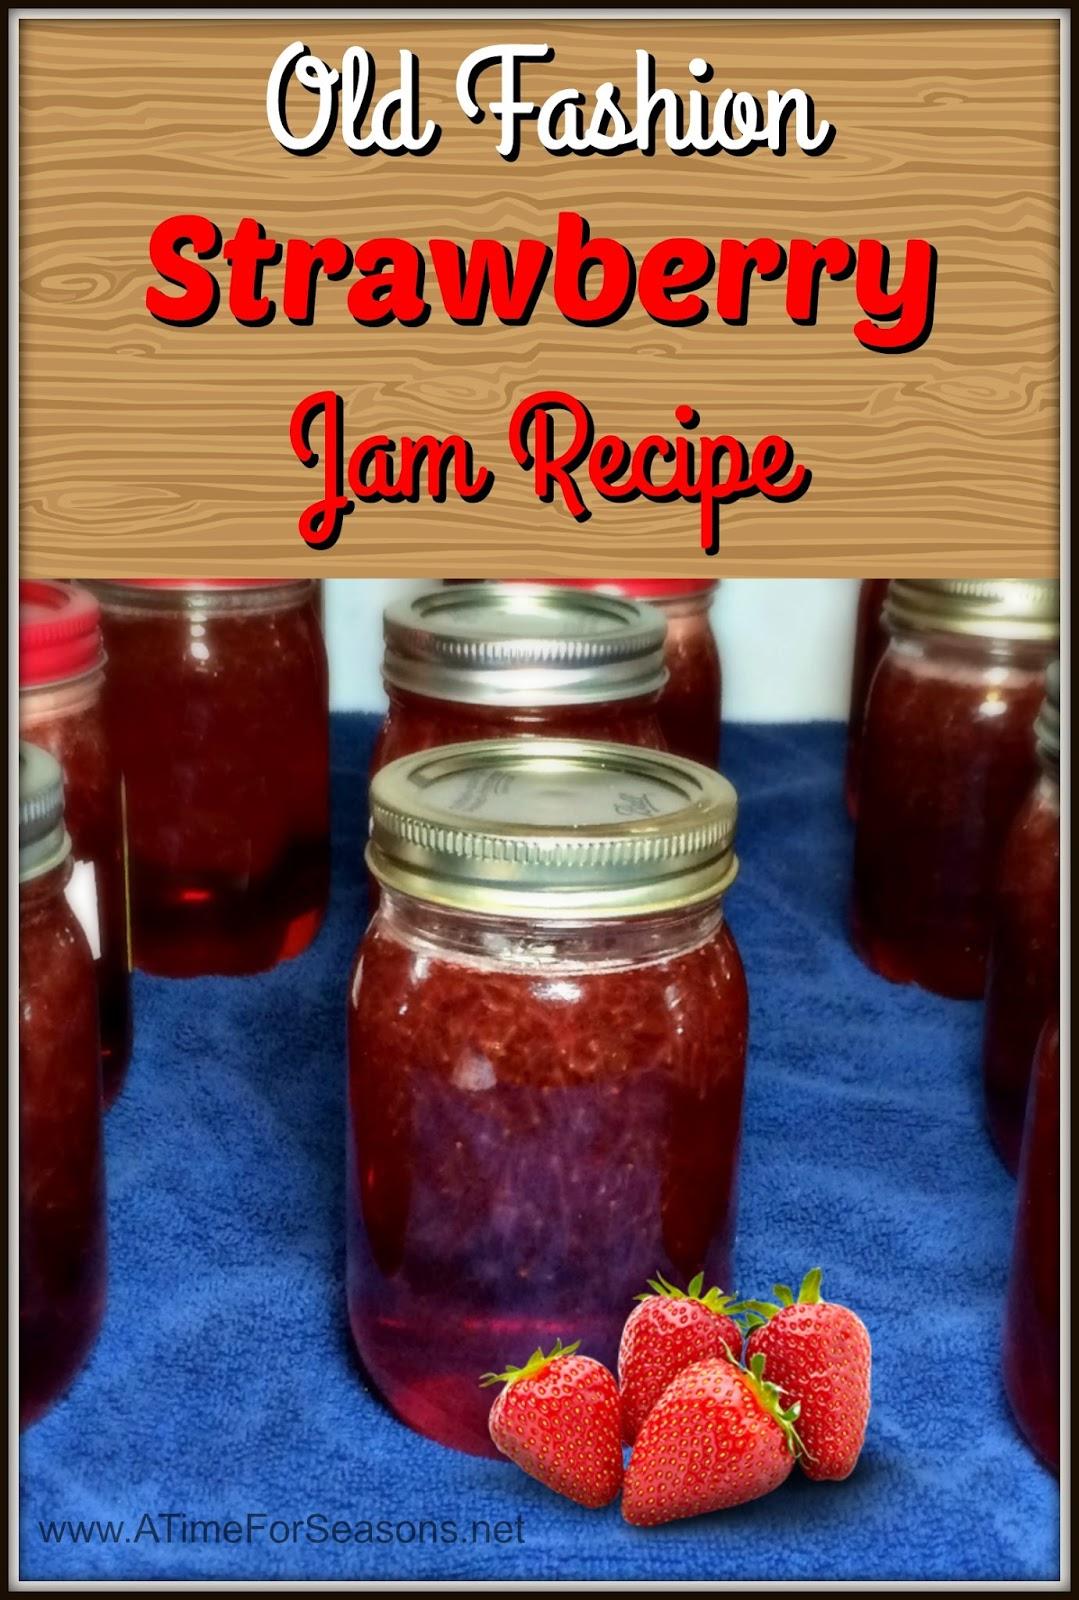 Old Fashion Strawberry Jam Recipe